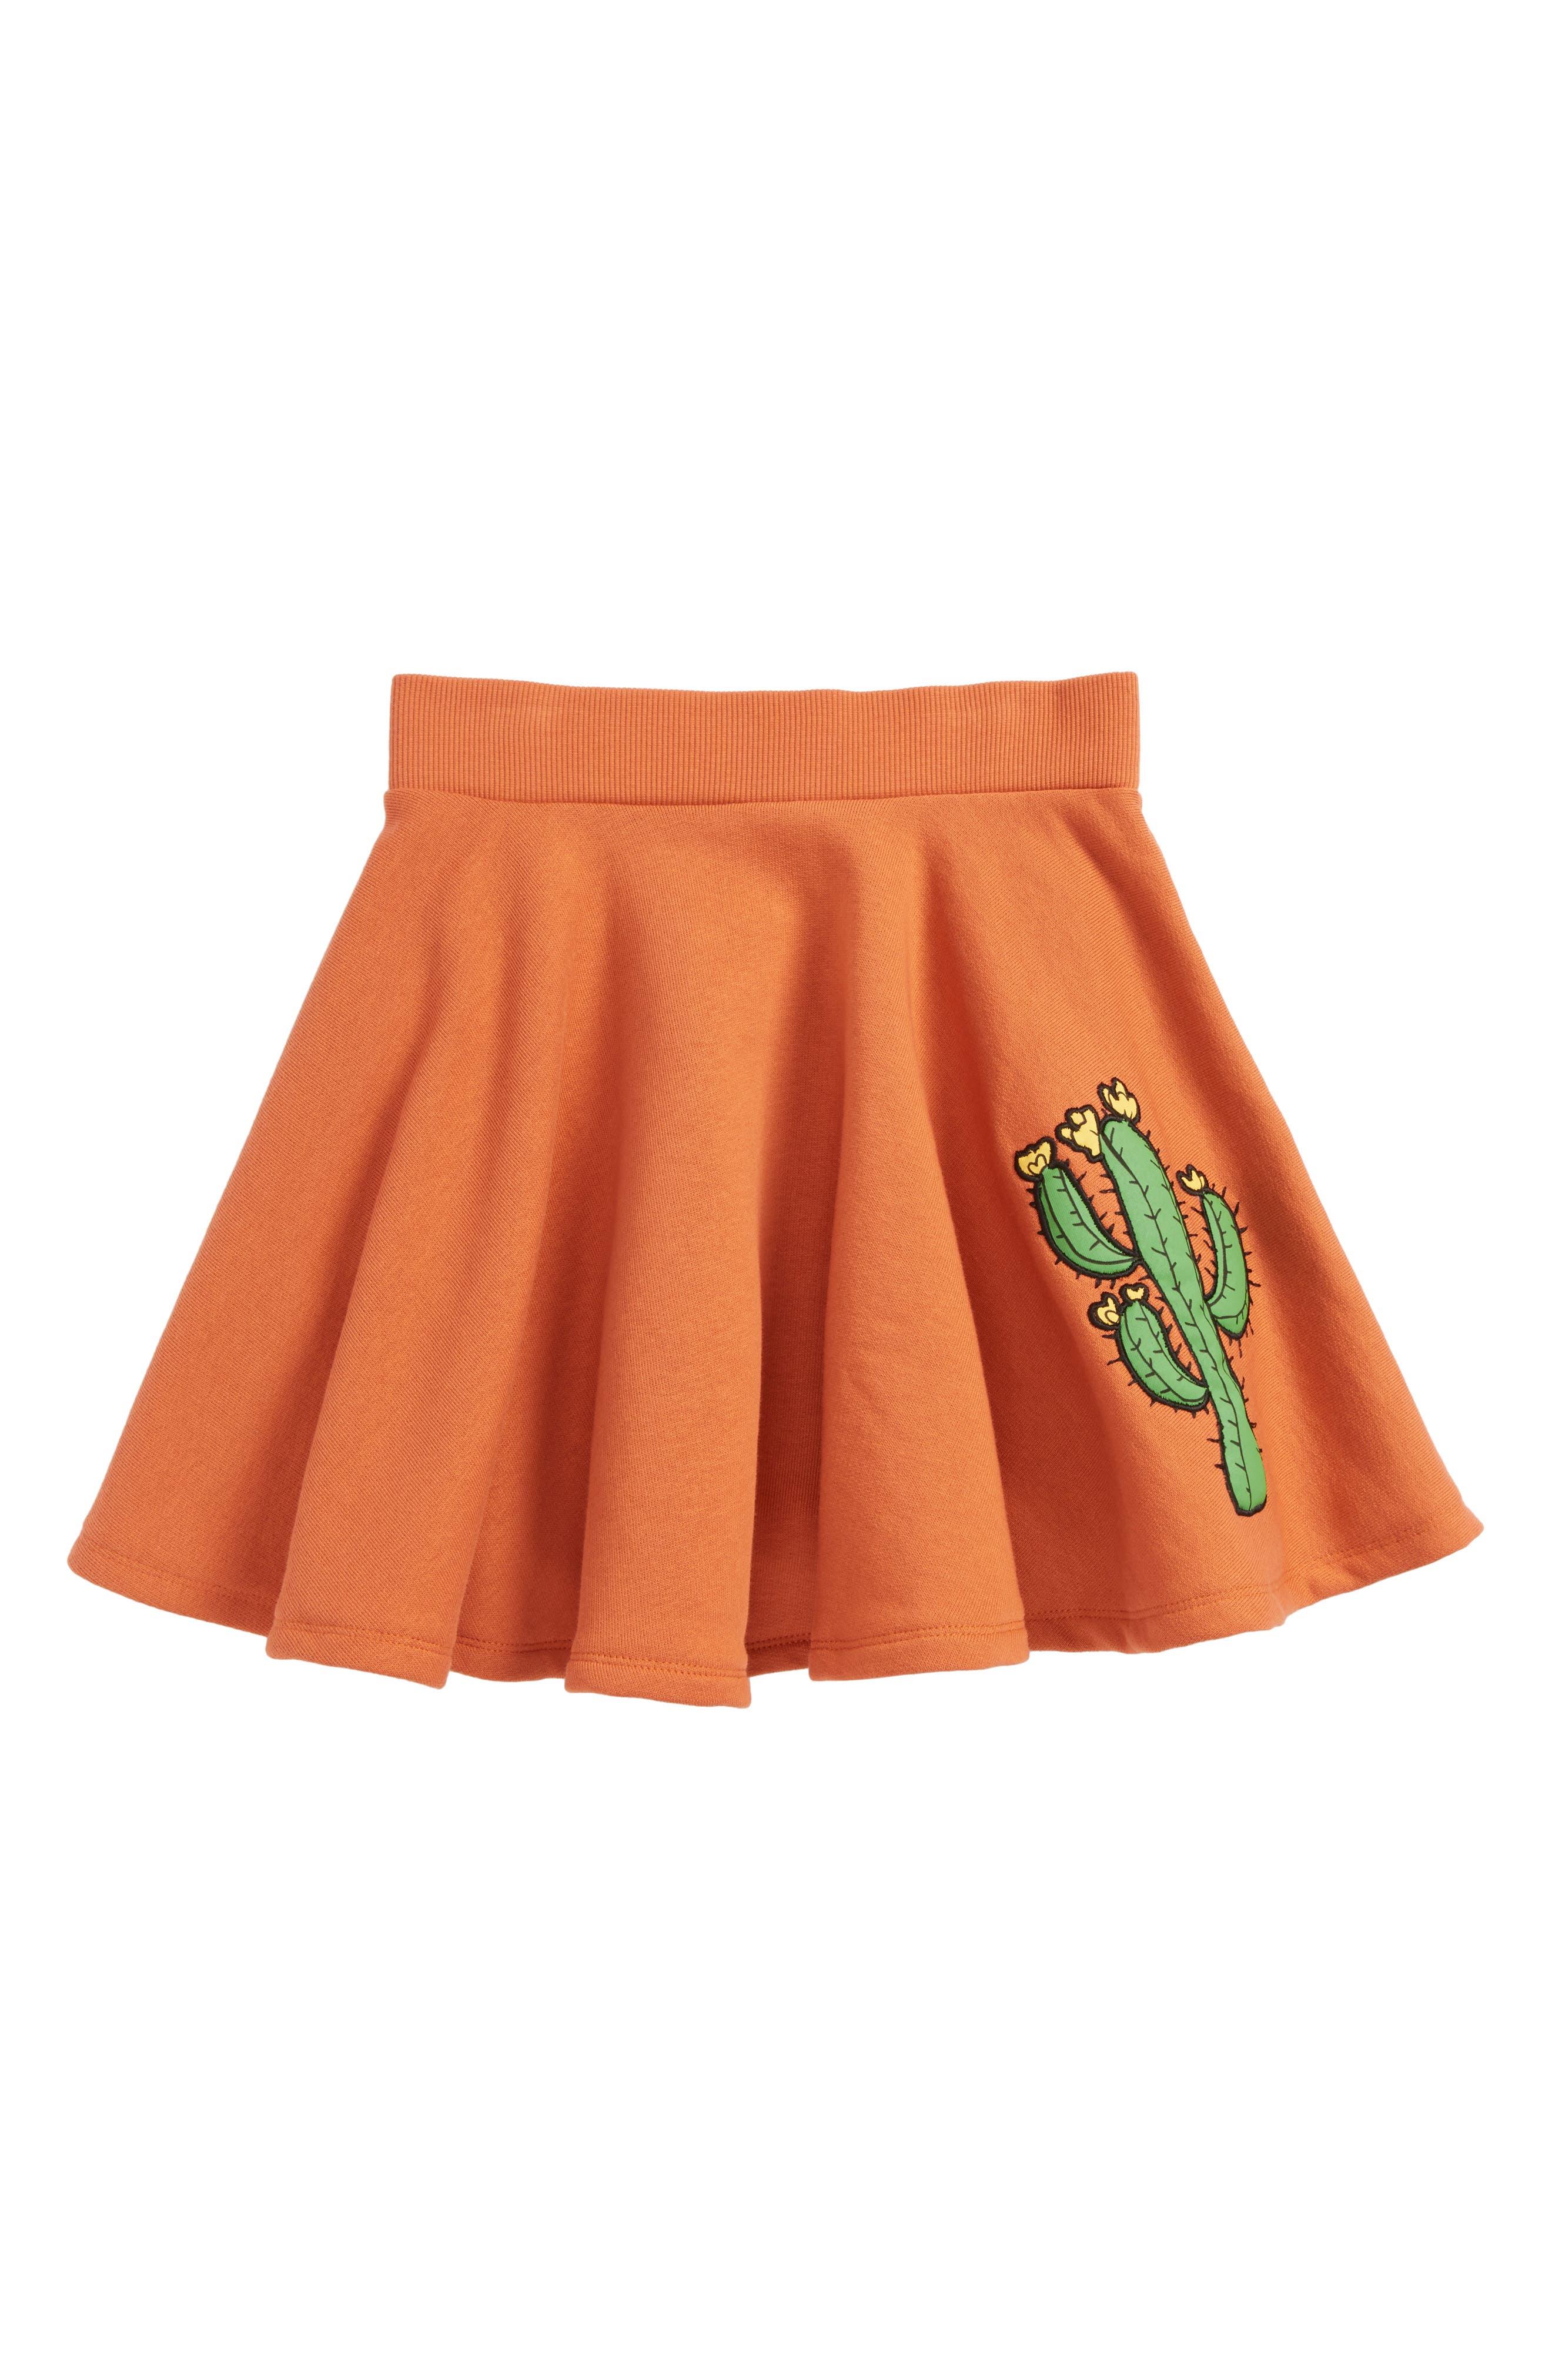 Appliqué Cactus Organic Cotton Circle Skirt,                             Main thumbnail 1, color,                             800